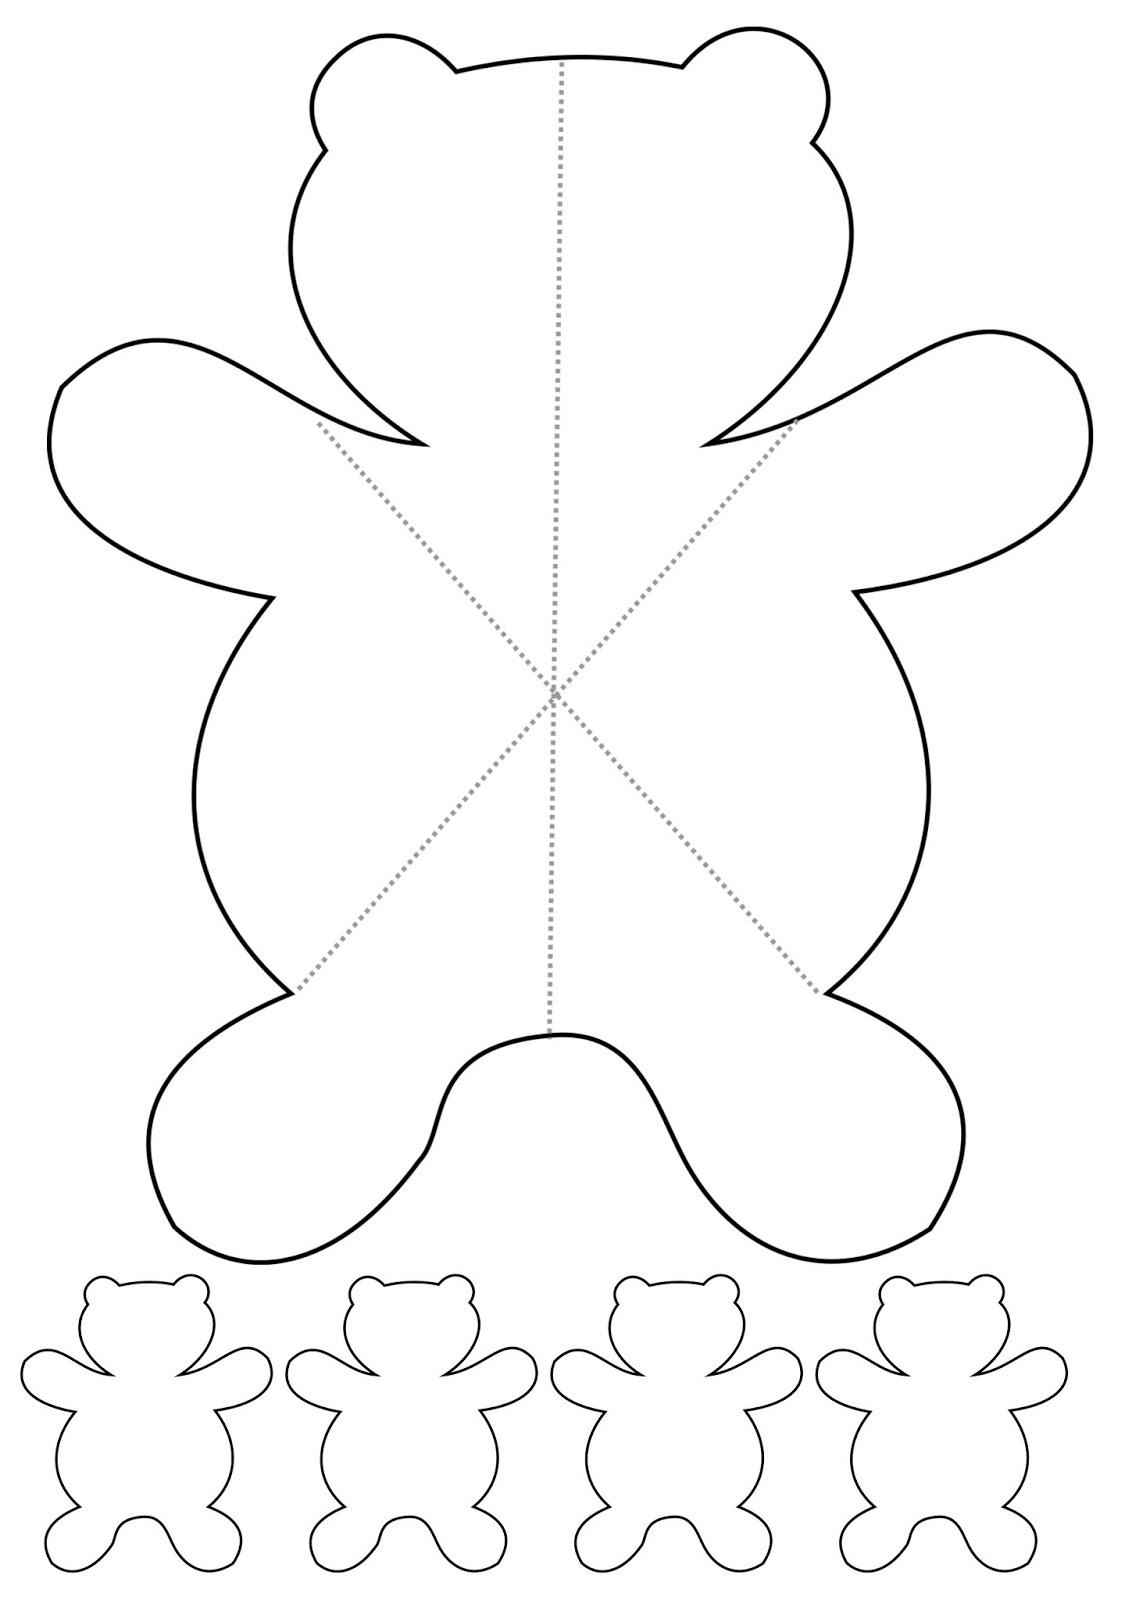 Haz click para imprimir el patron de la tarjeta osito teddy pop up